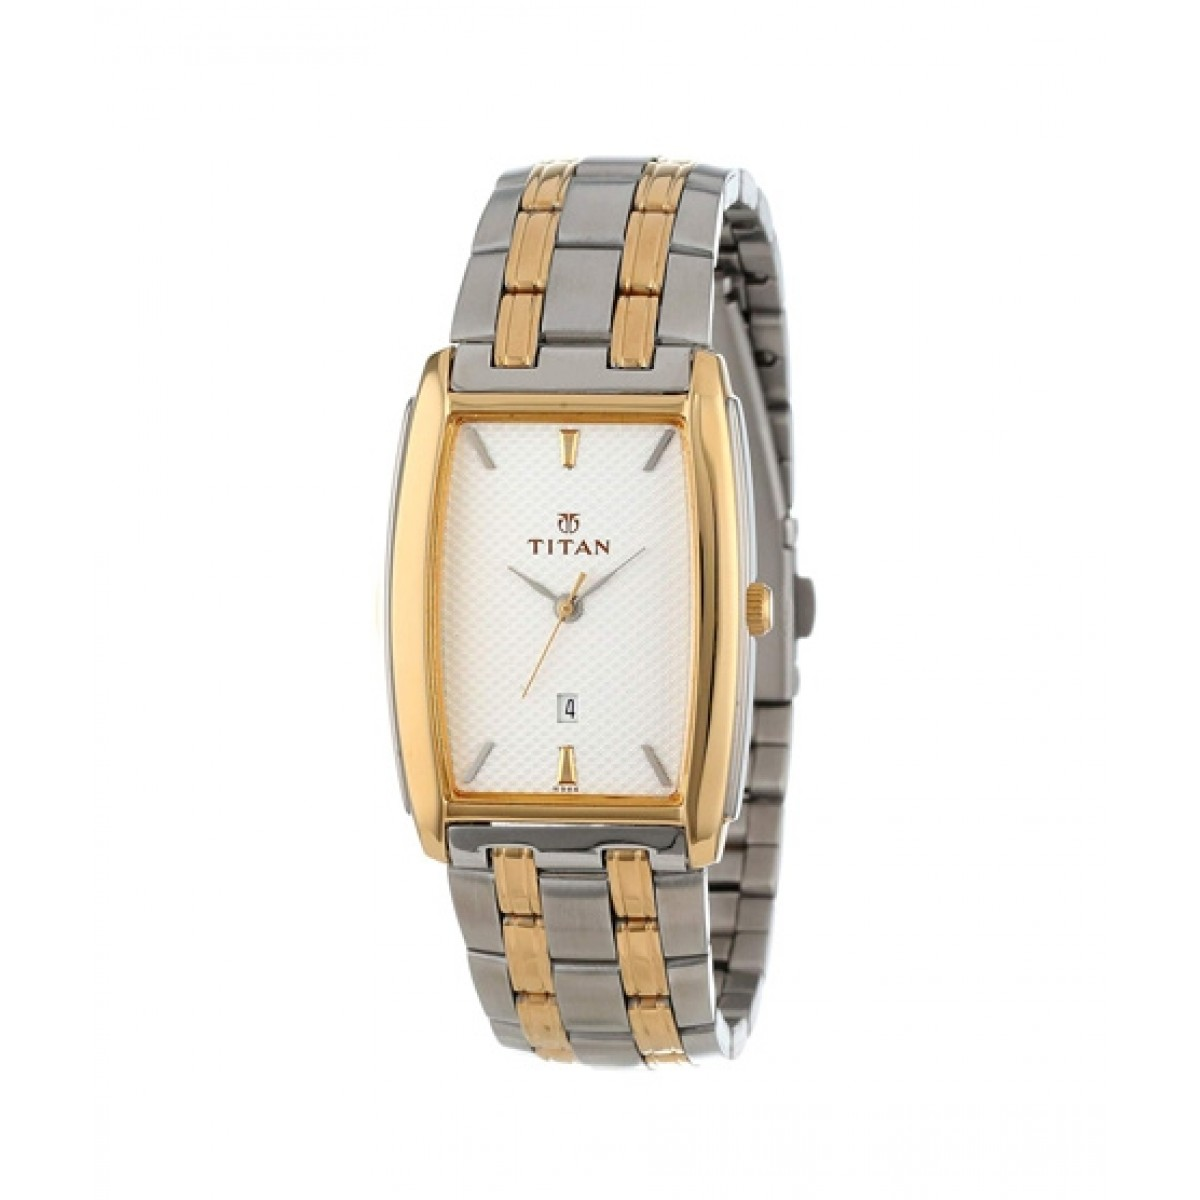 Titan Regalia Men's Watch Two Tone (1163BM01)